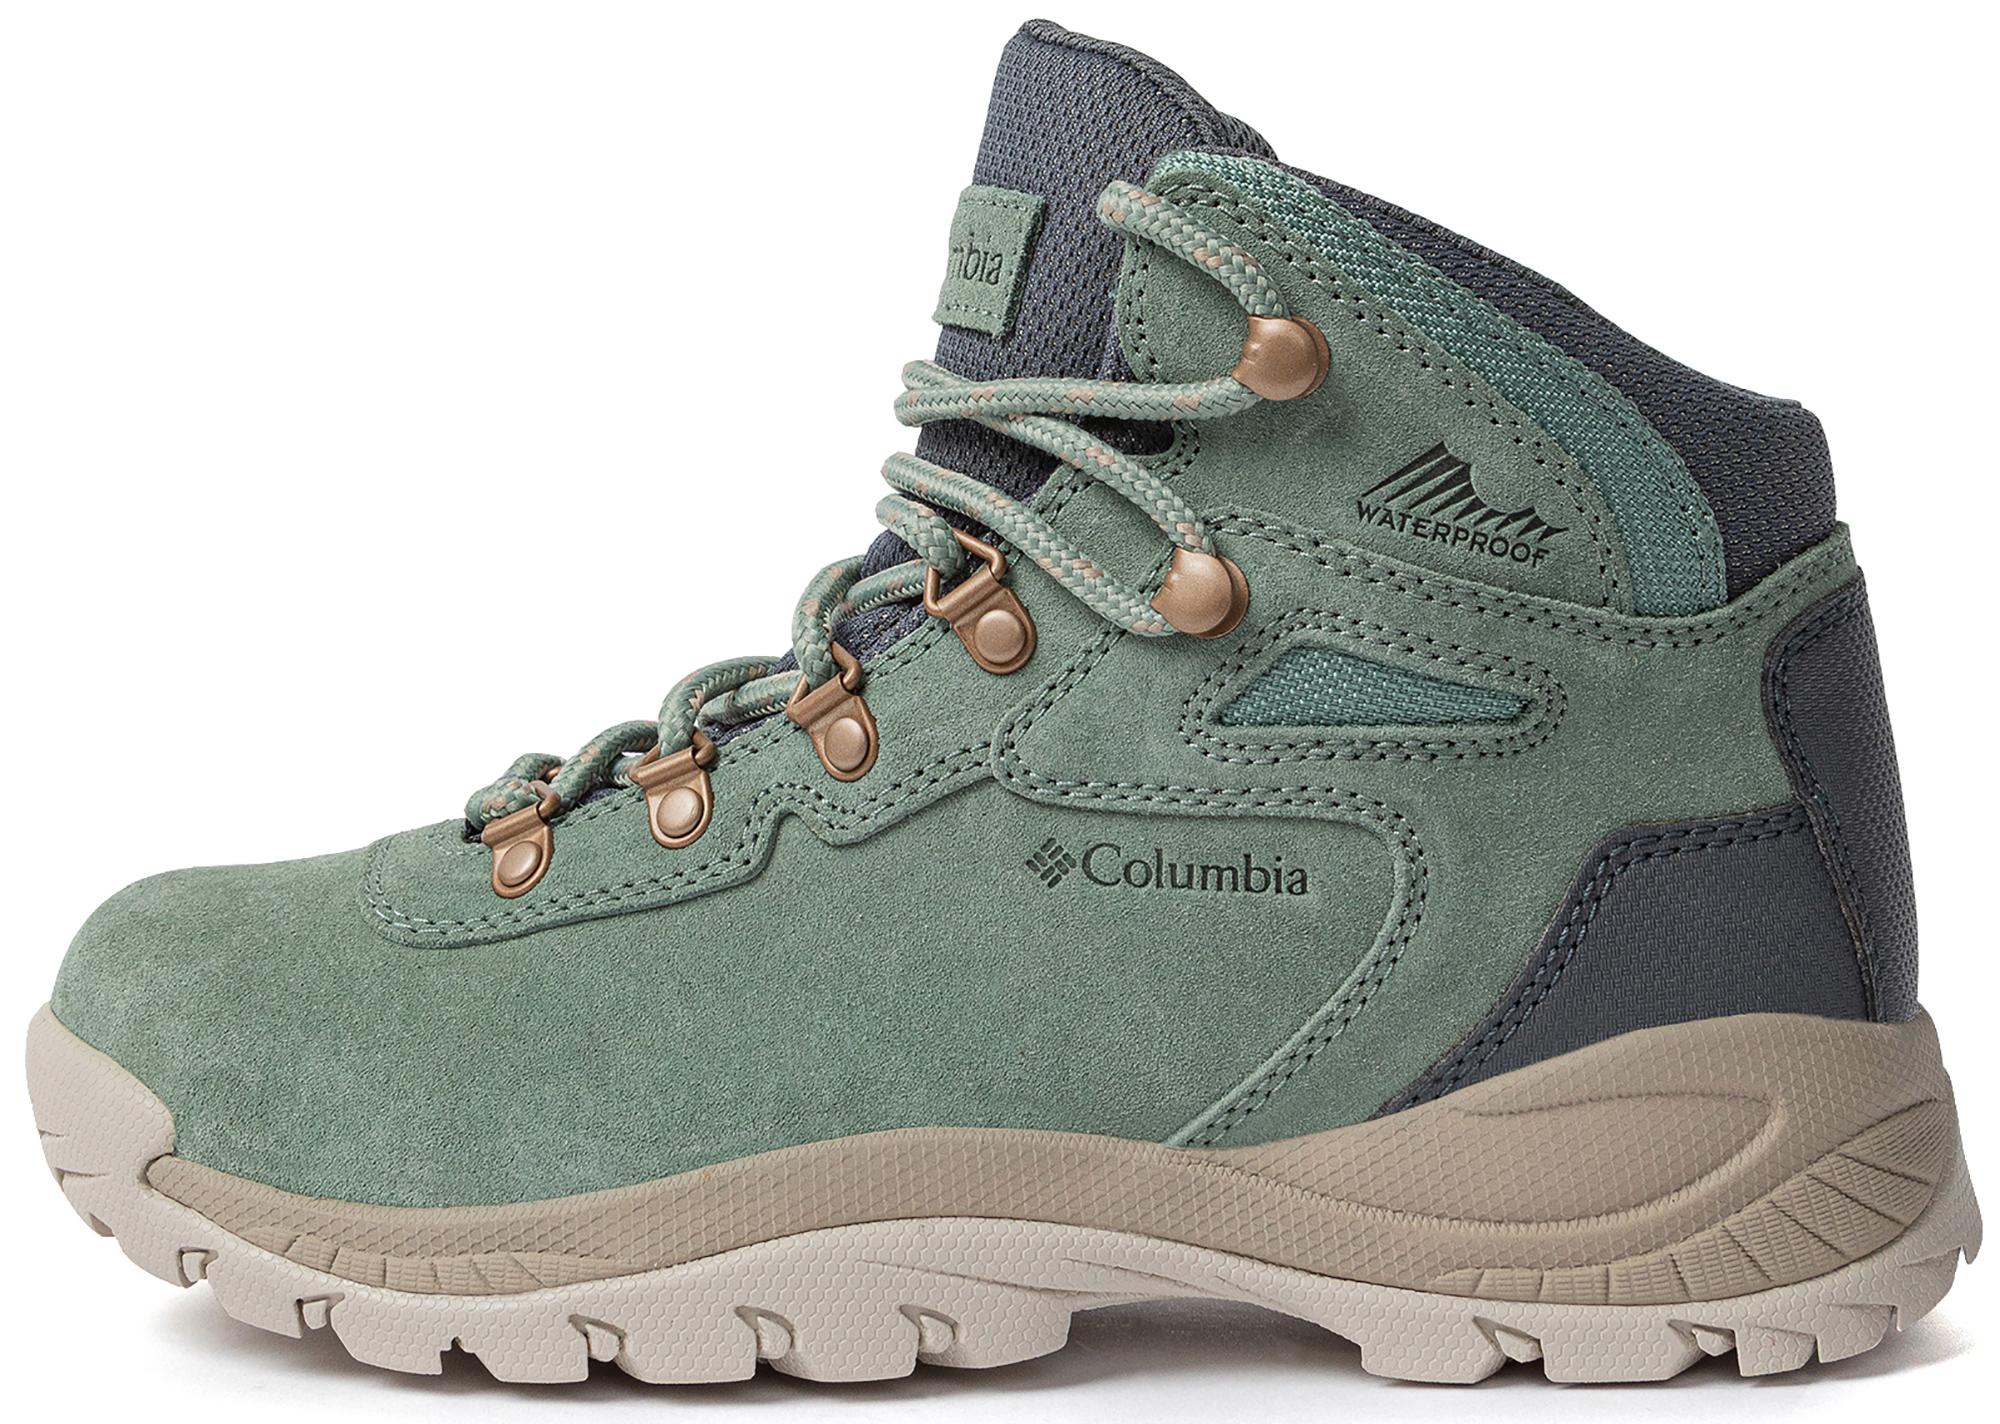 Columbia Ботинки женские Columbia Newton Ridge Plus, размер 38 ботинки мужские columbia newton ridge plus ii suede wp цвет зеленый 1746411 213 размер 9 42